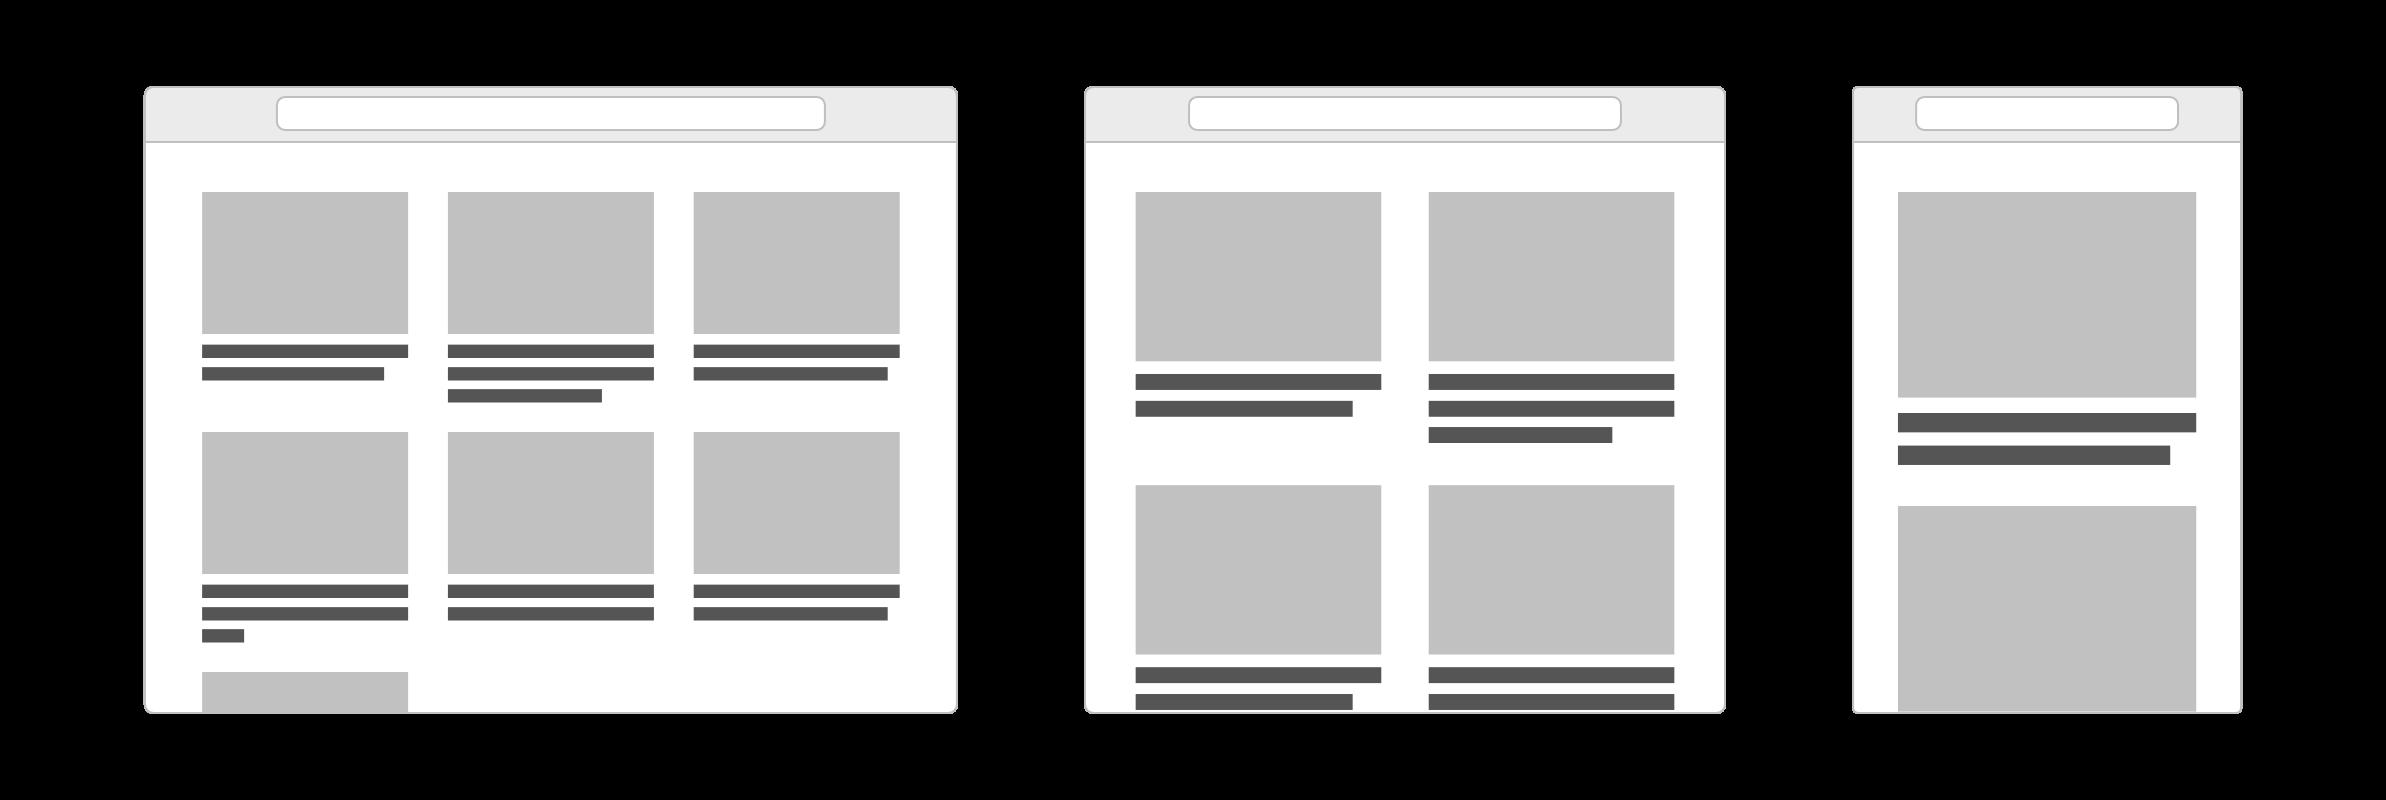 block-grid-layout@2x